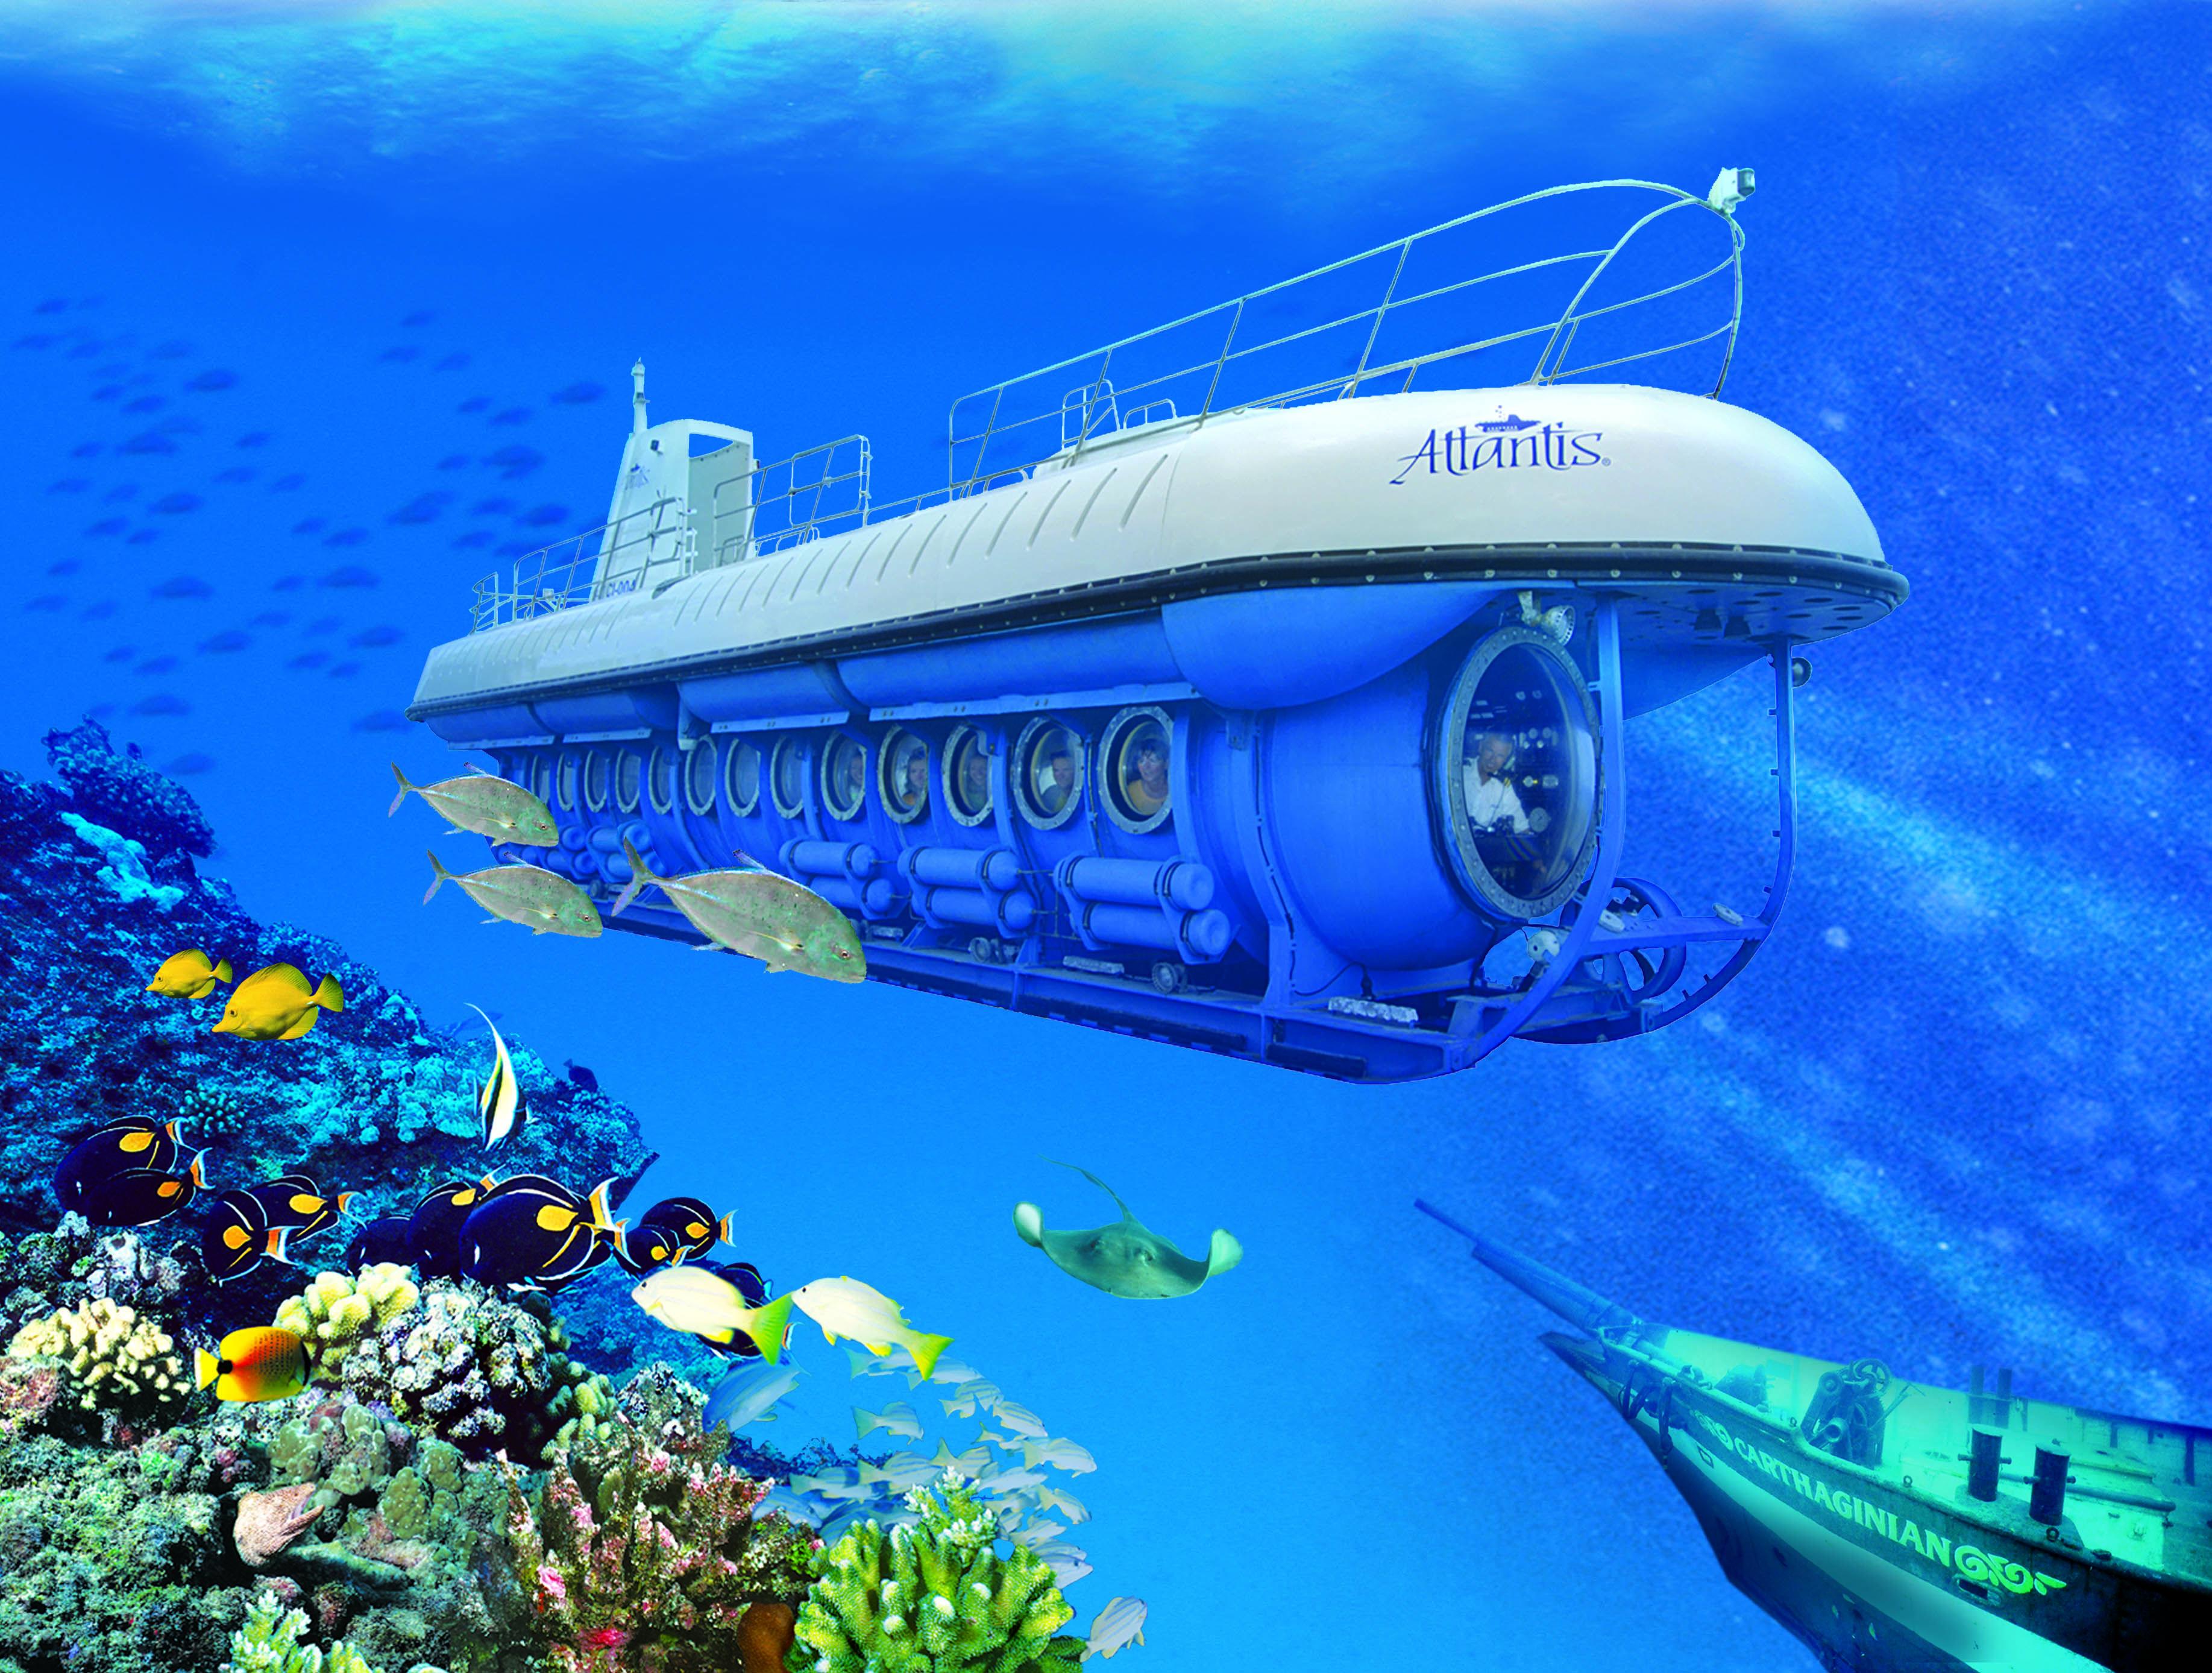 Atlantis submarine maui hawaii sat at the bottom of the pacific atlantis submarine maui hawaii sat at the bottom of the pacific ocean ystal sciox Gallery